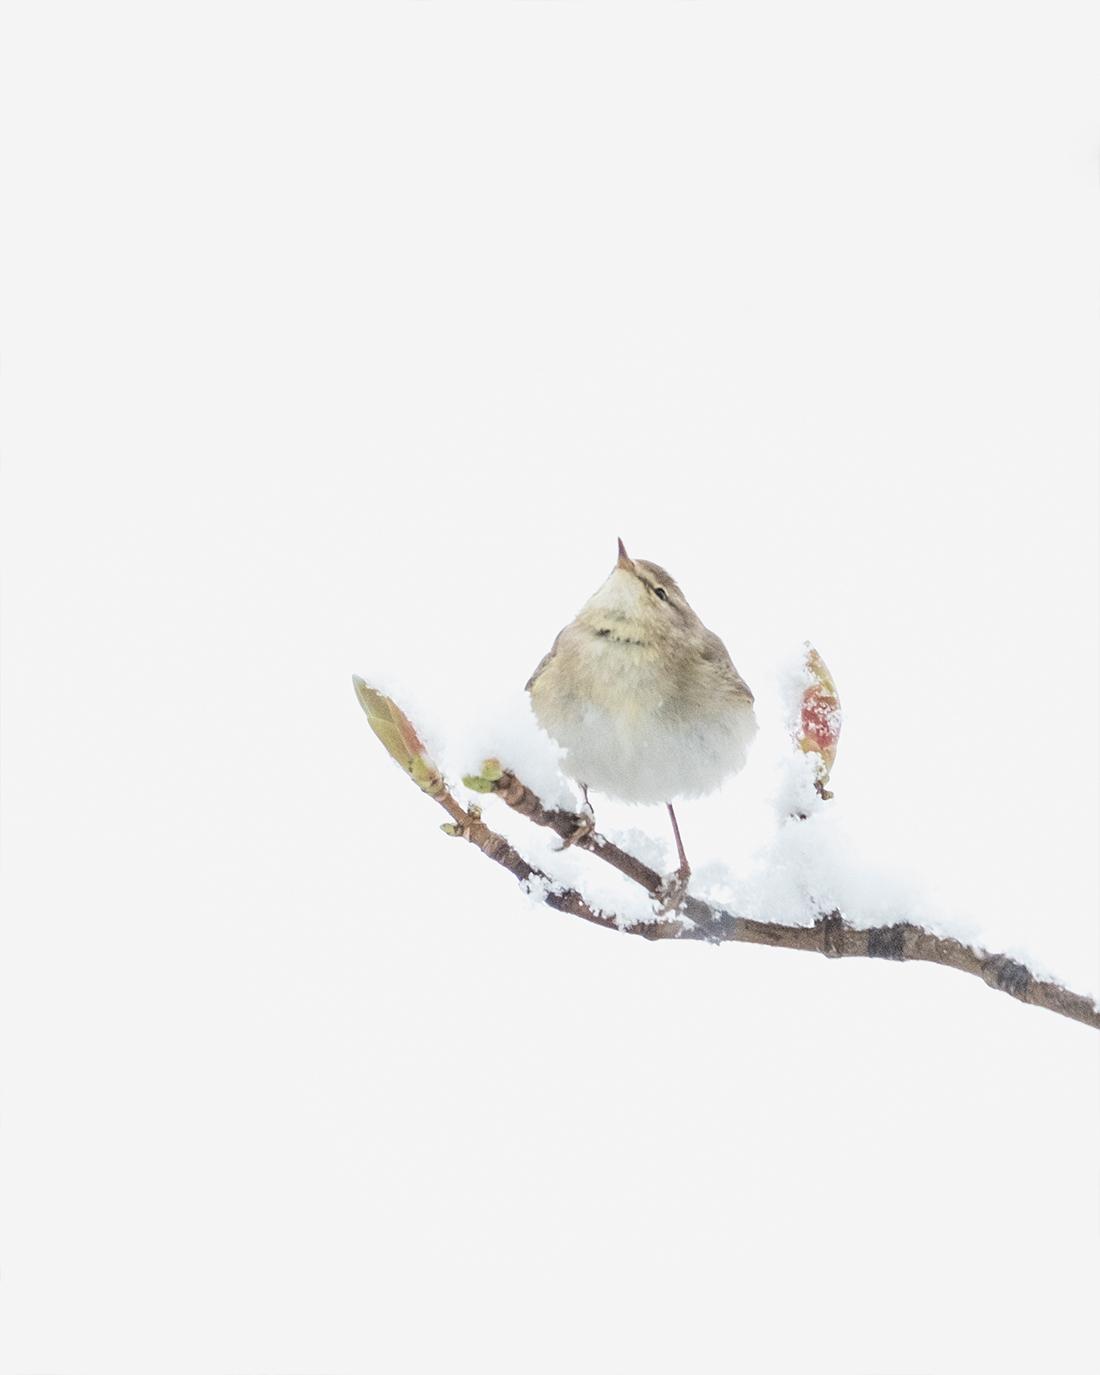 DSCF6492-1WEB2-fuglefoto-løvsanger-trondheim-cecile-jystad-kunstfoto